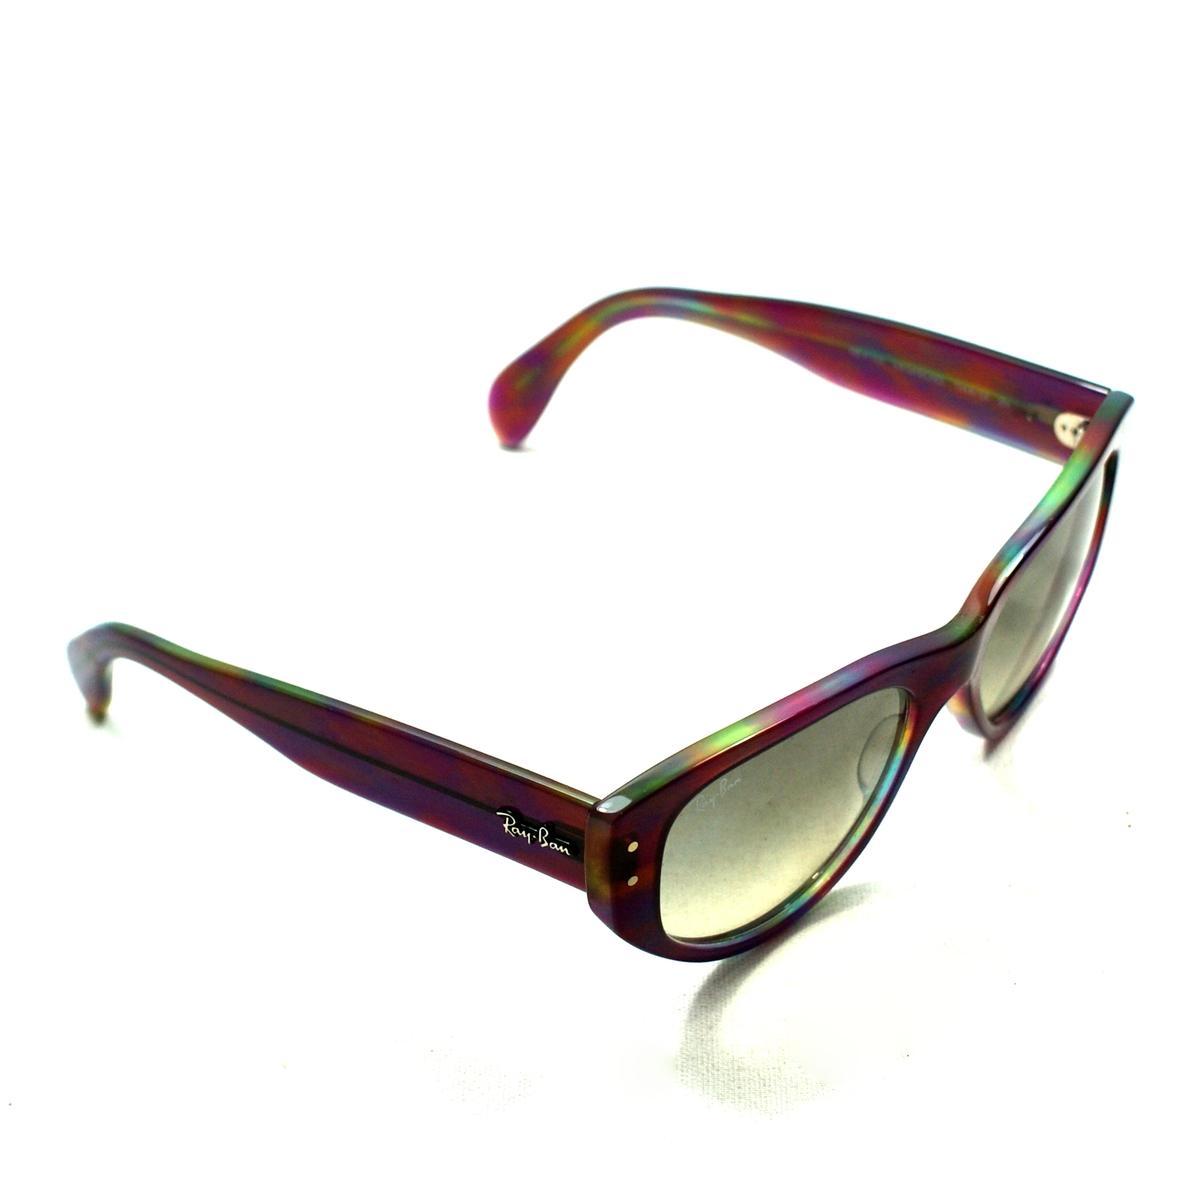 ray ban vagabond  Ray Ban Ray Ban Vagabond Sunglasses #RB4152 1058/32